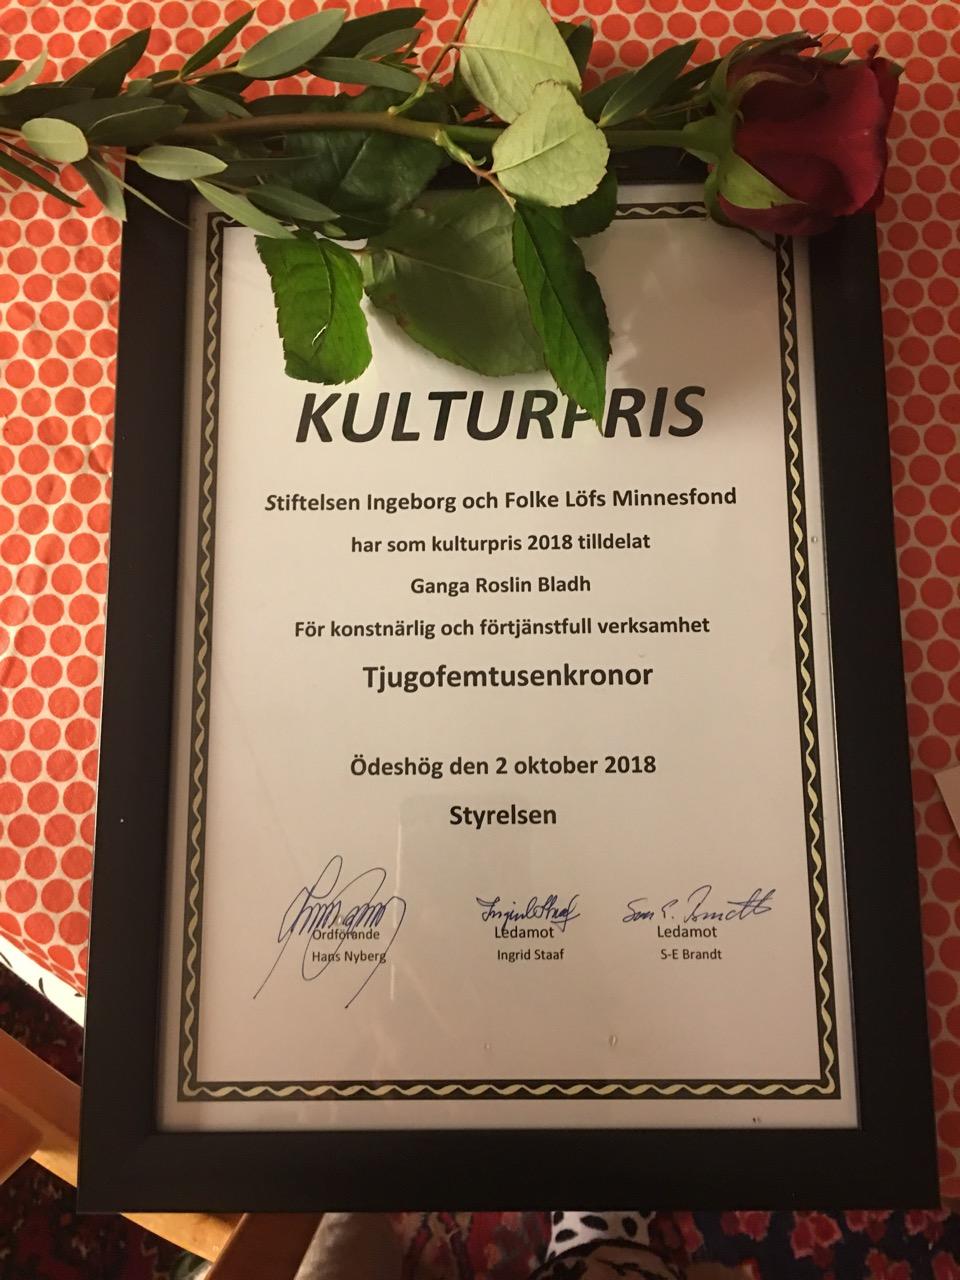 kulturpris 2018, Ganga Roslin Bladh, Löfs